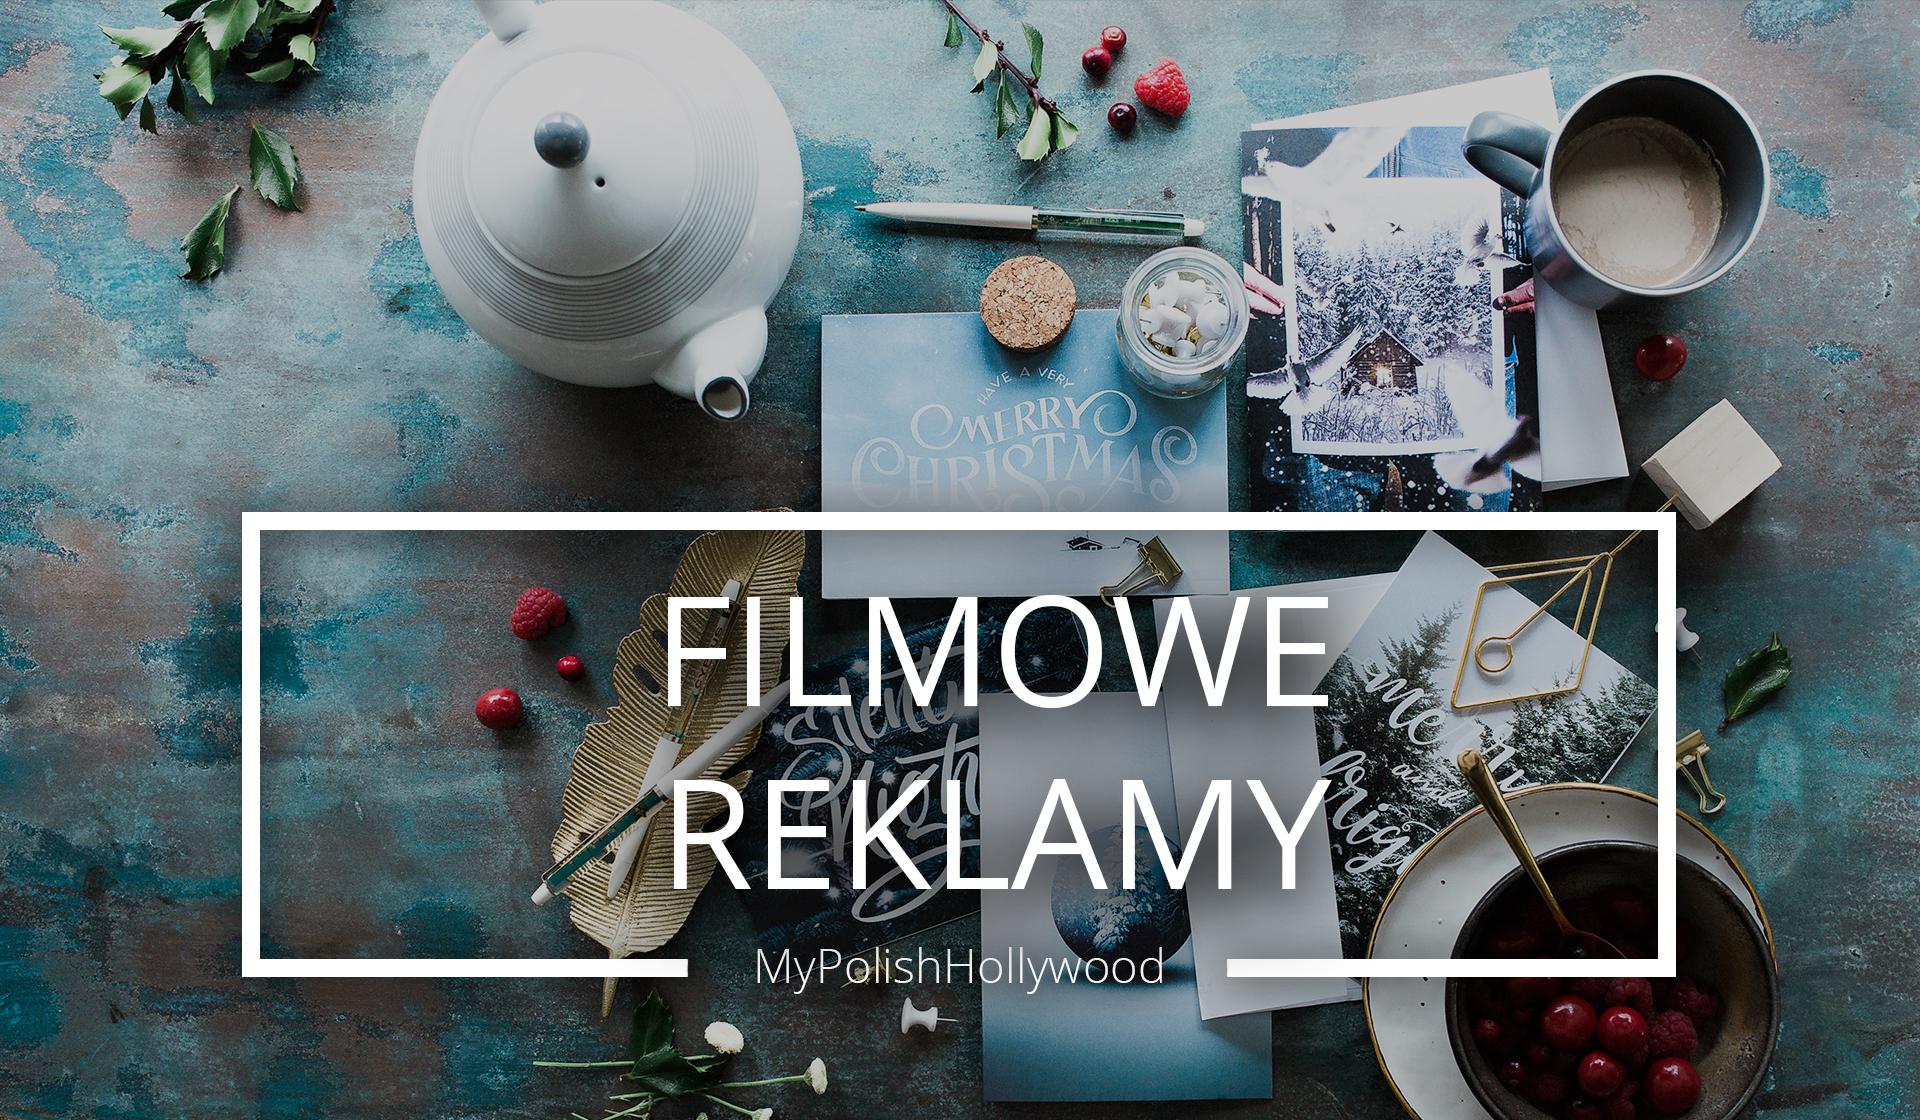 fILMOWE REKLAMY